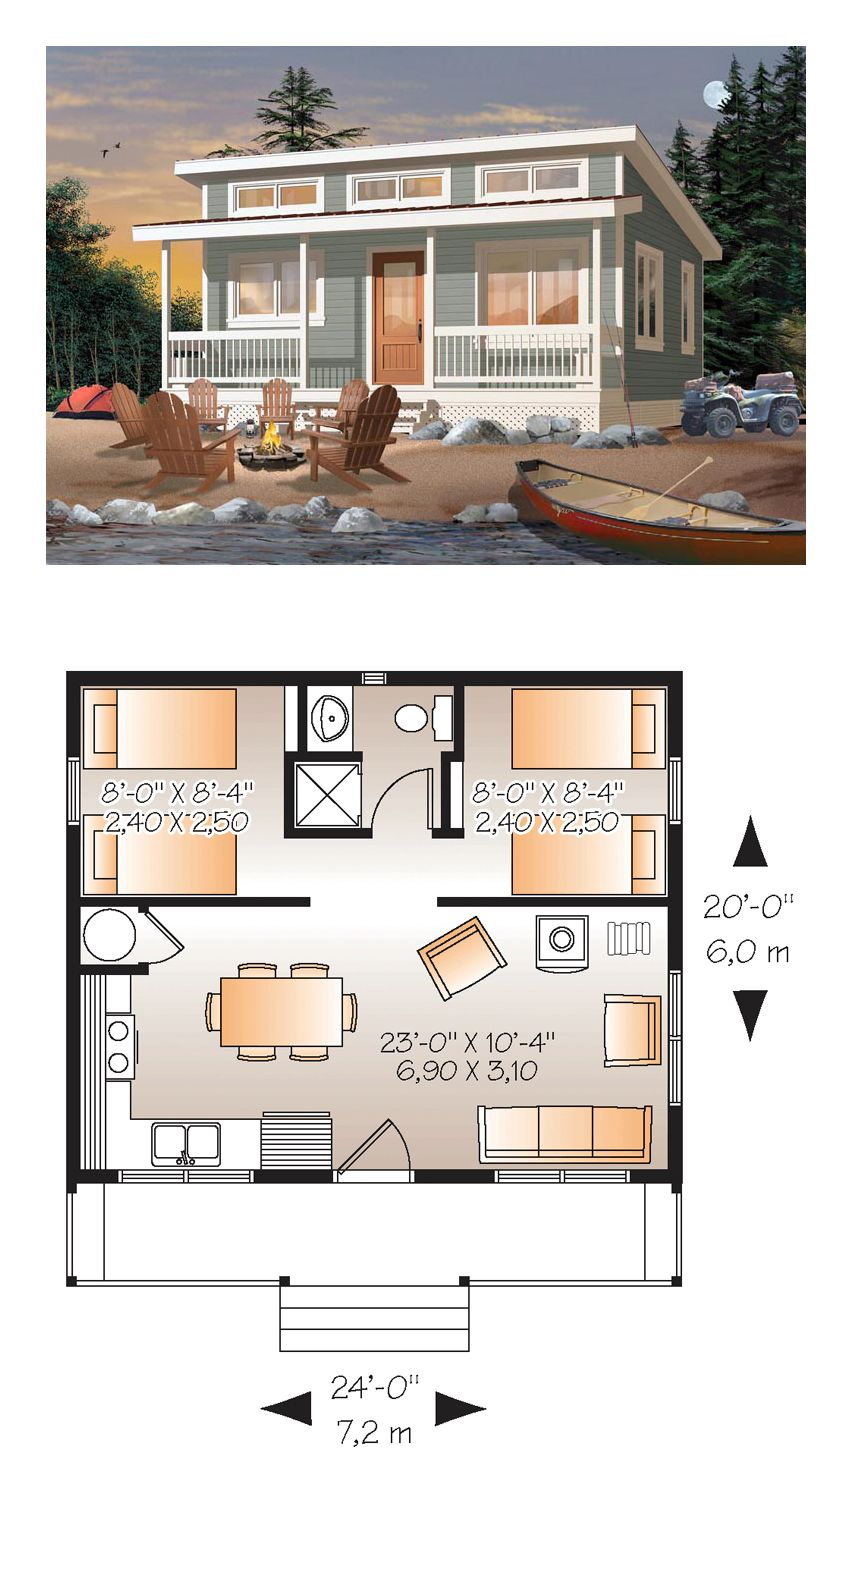 2 Bedroom Tiny House Plans